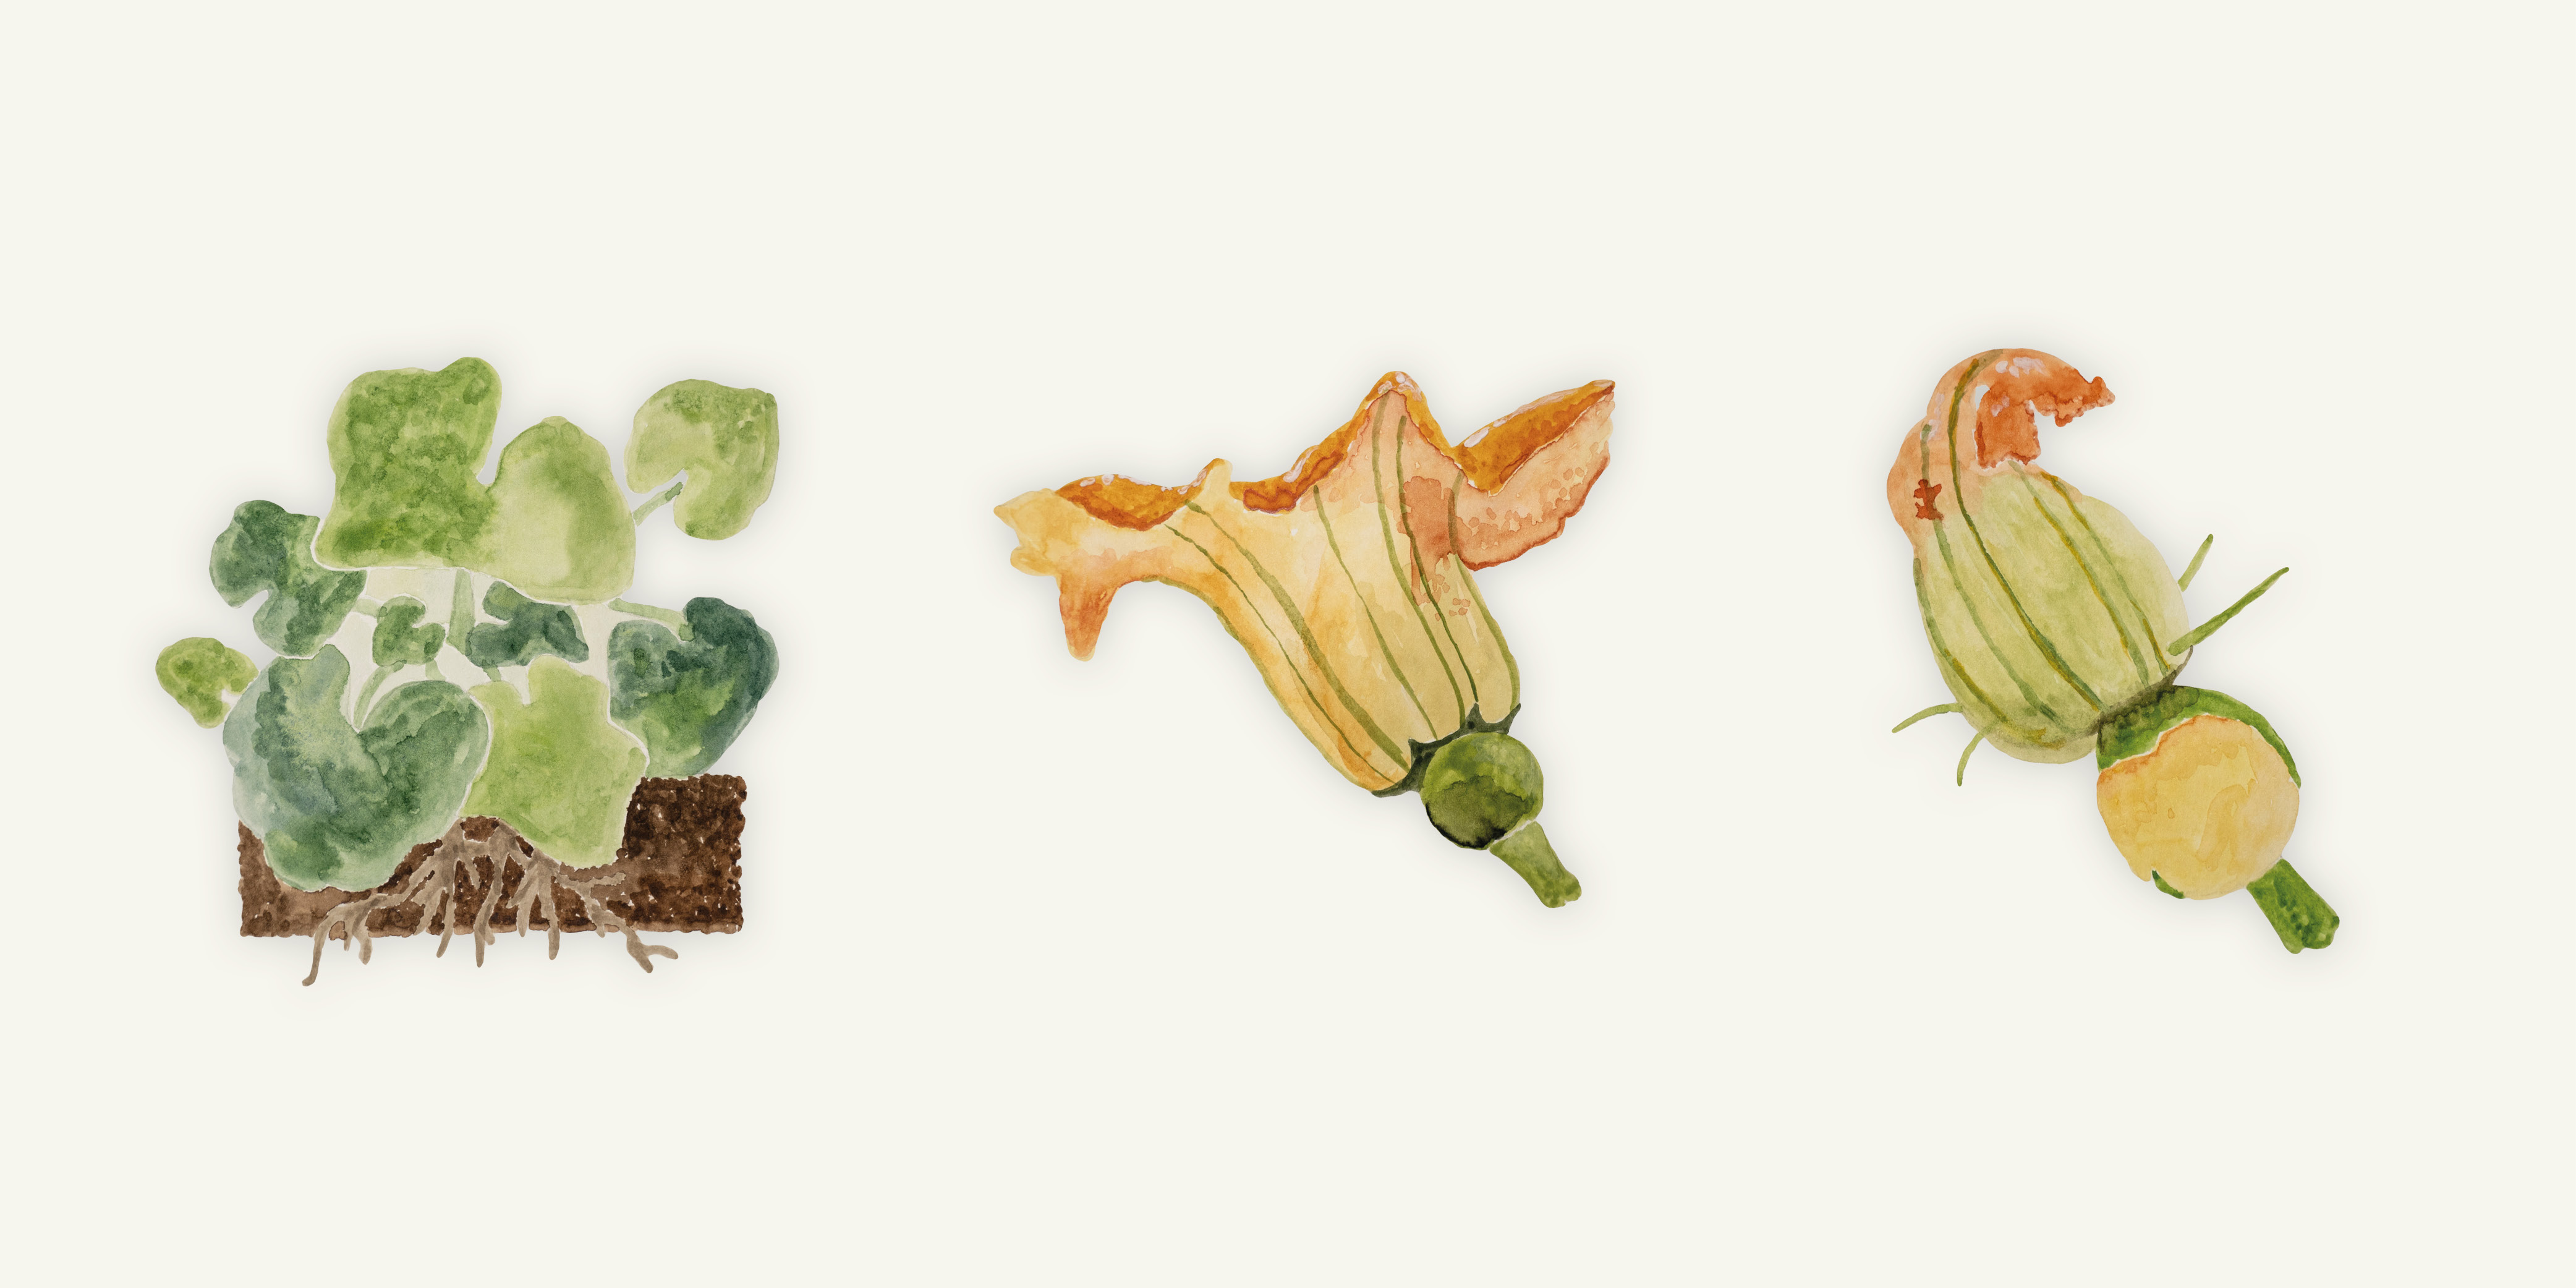 Kürbispflanze im Wachstum